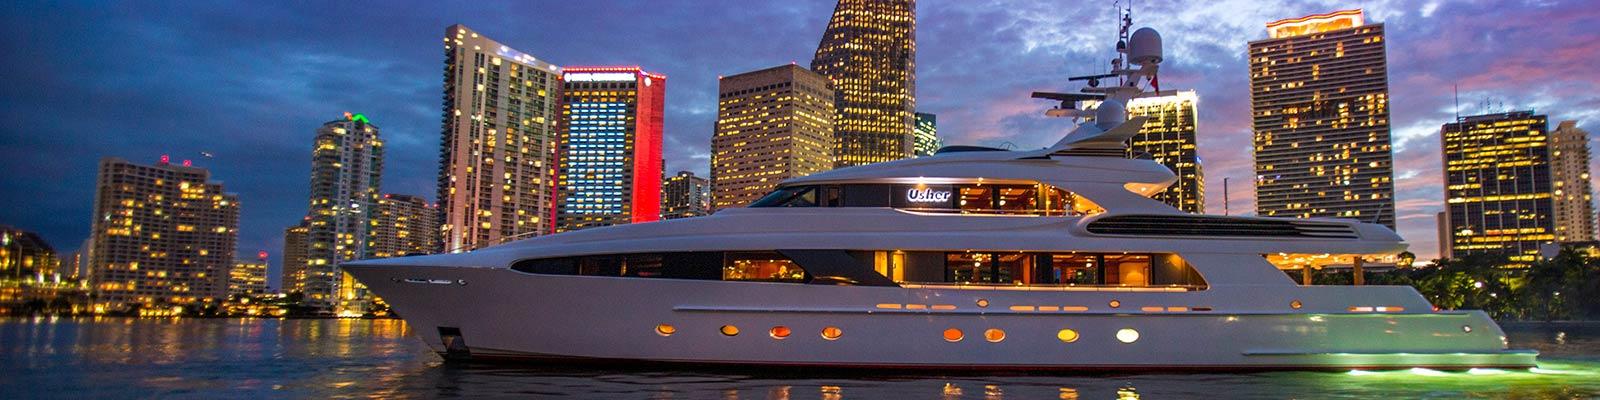 Luxury yacht with Miami skyline in background